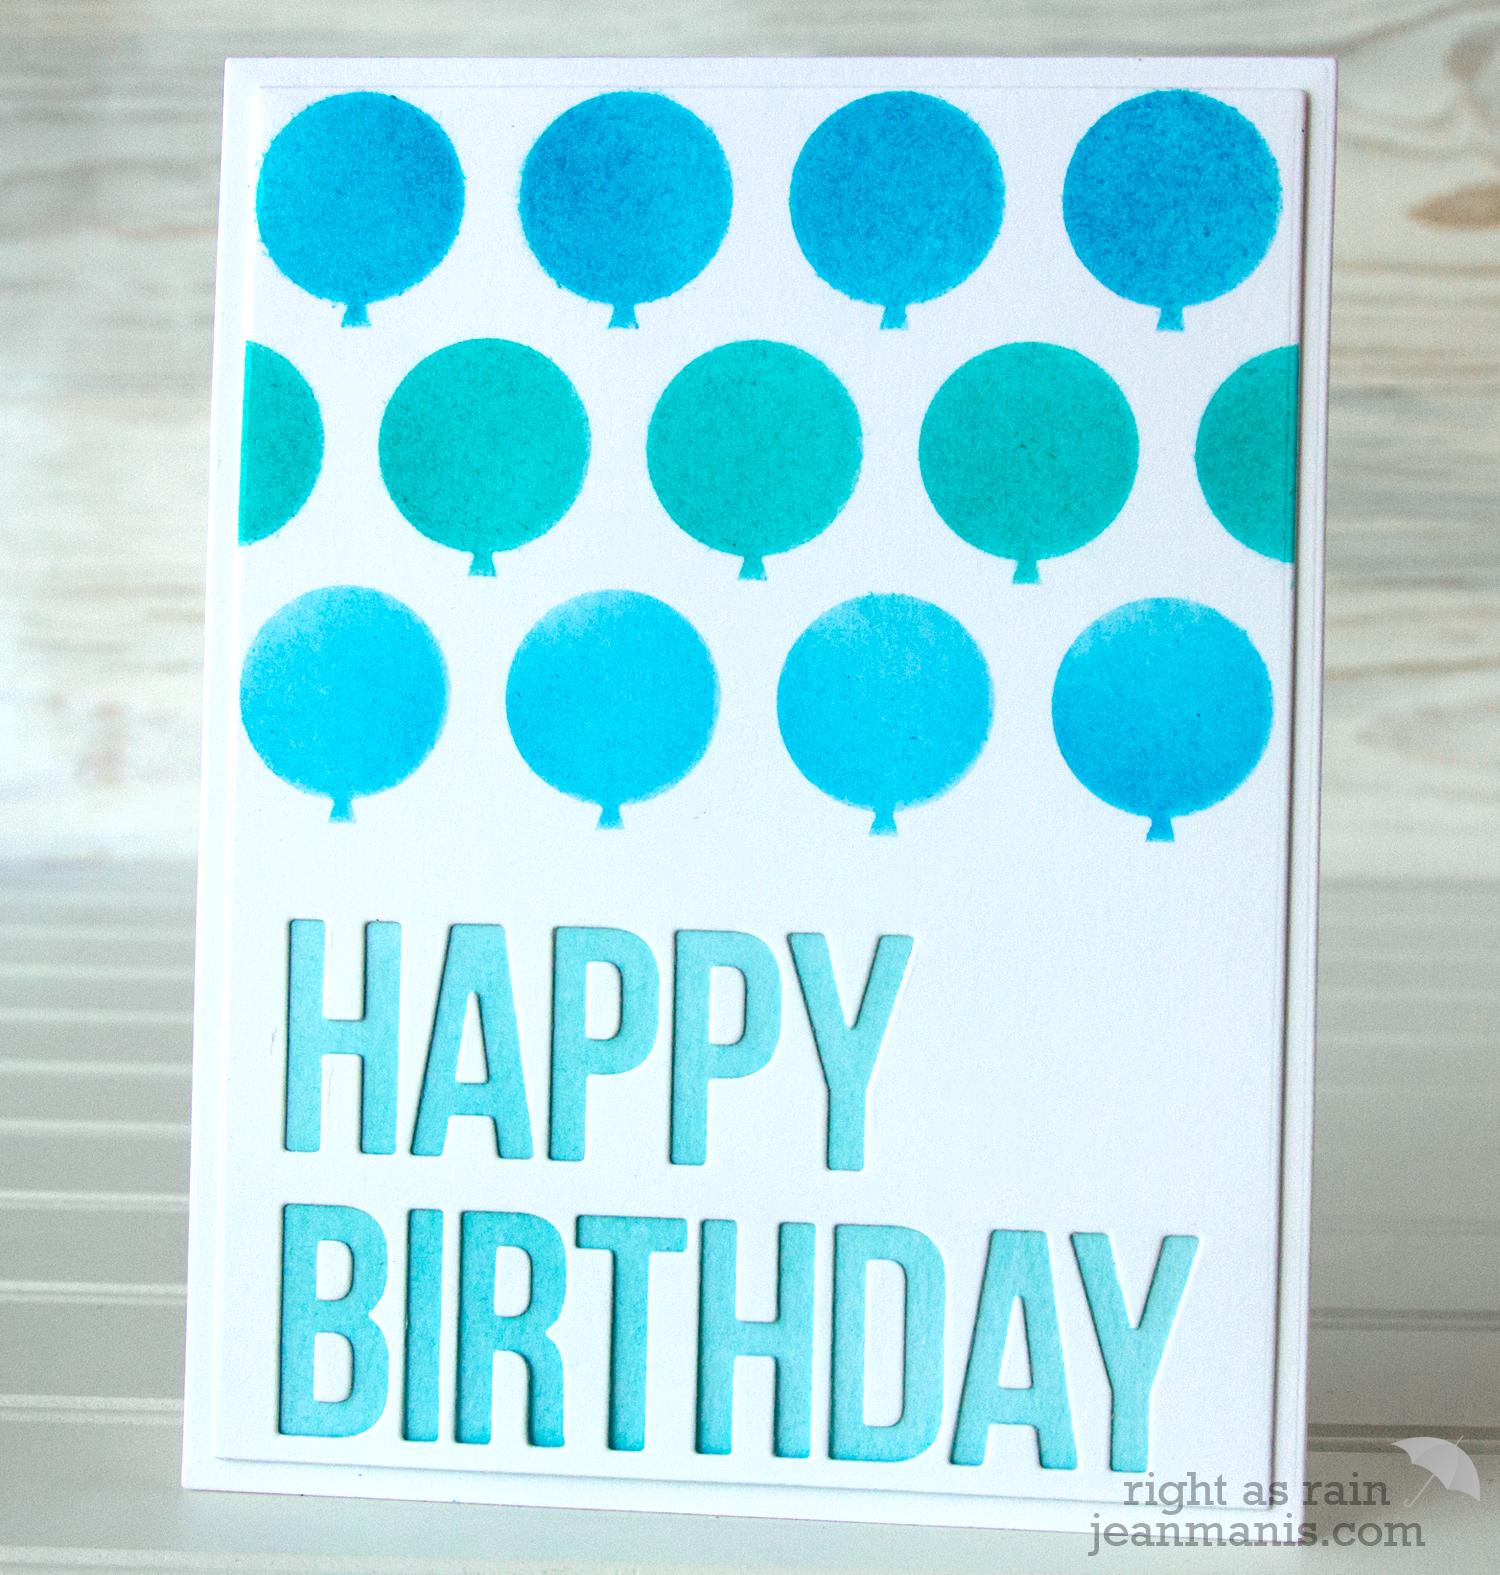 Happy Birthday Card - Echo Park Balloons Stencil